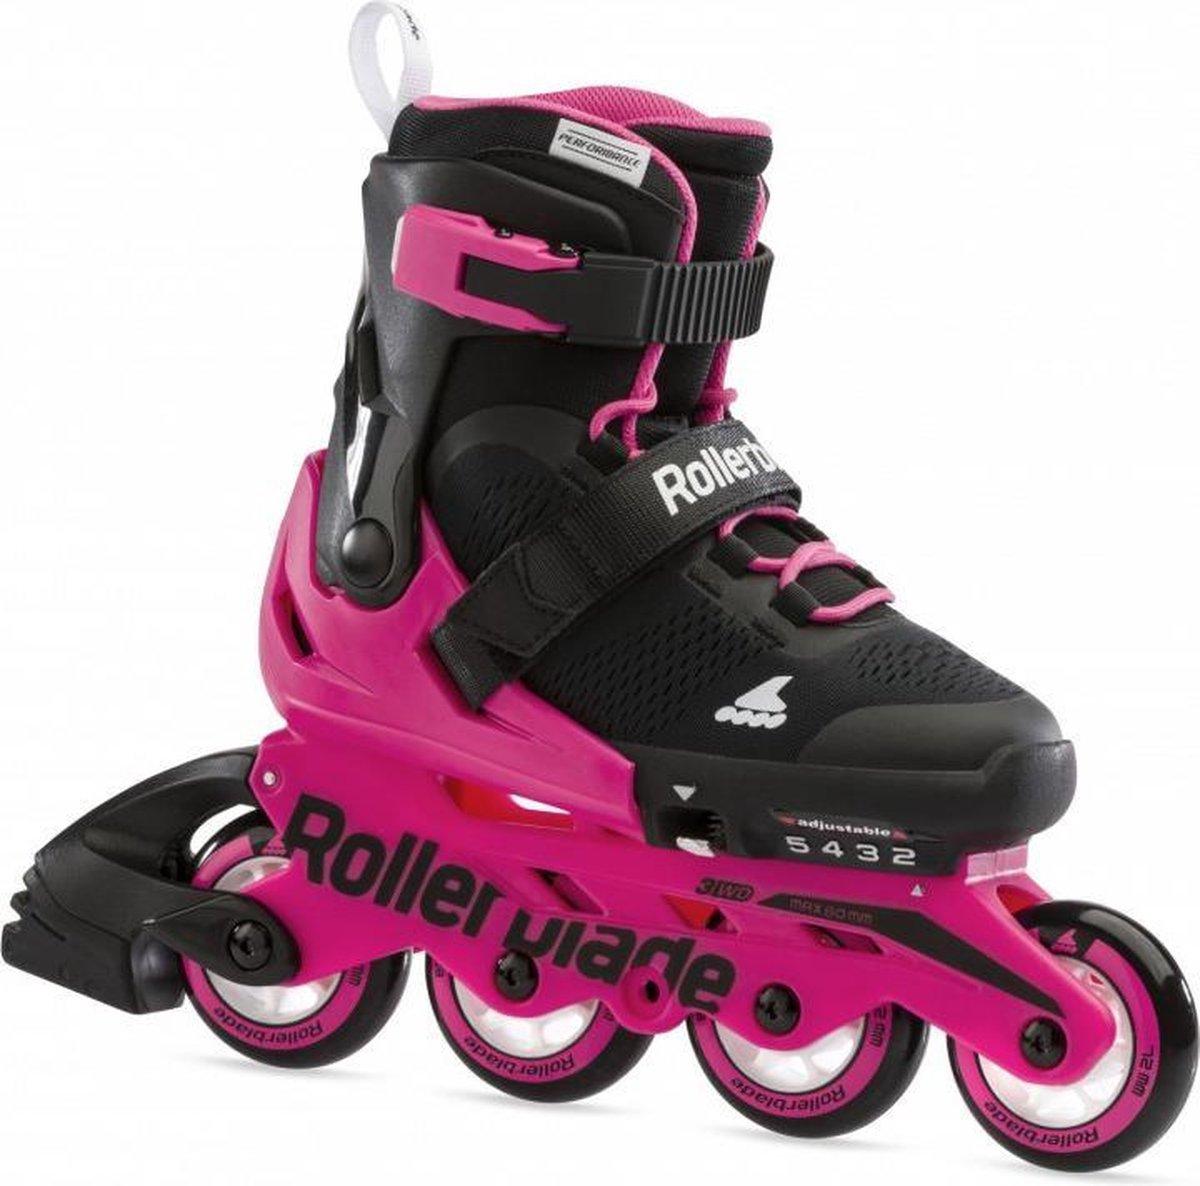 Rollerblade Microblade kinder inline skates 72 mm black / neon pink